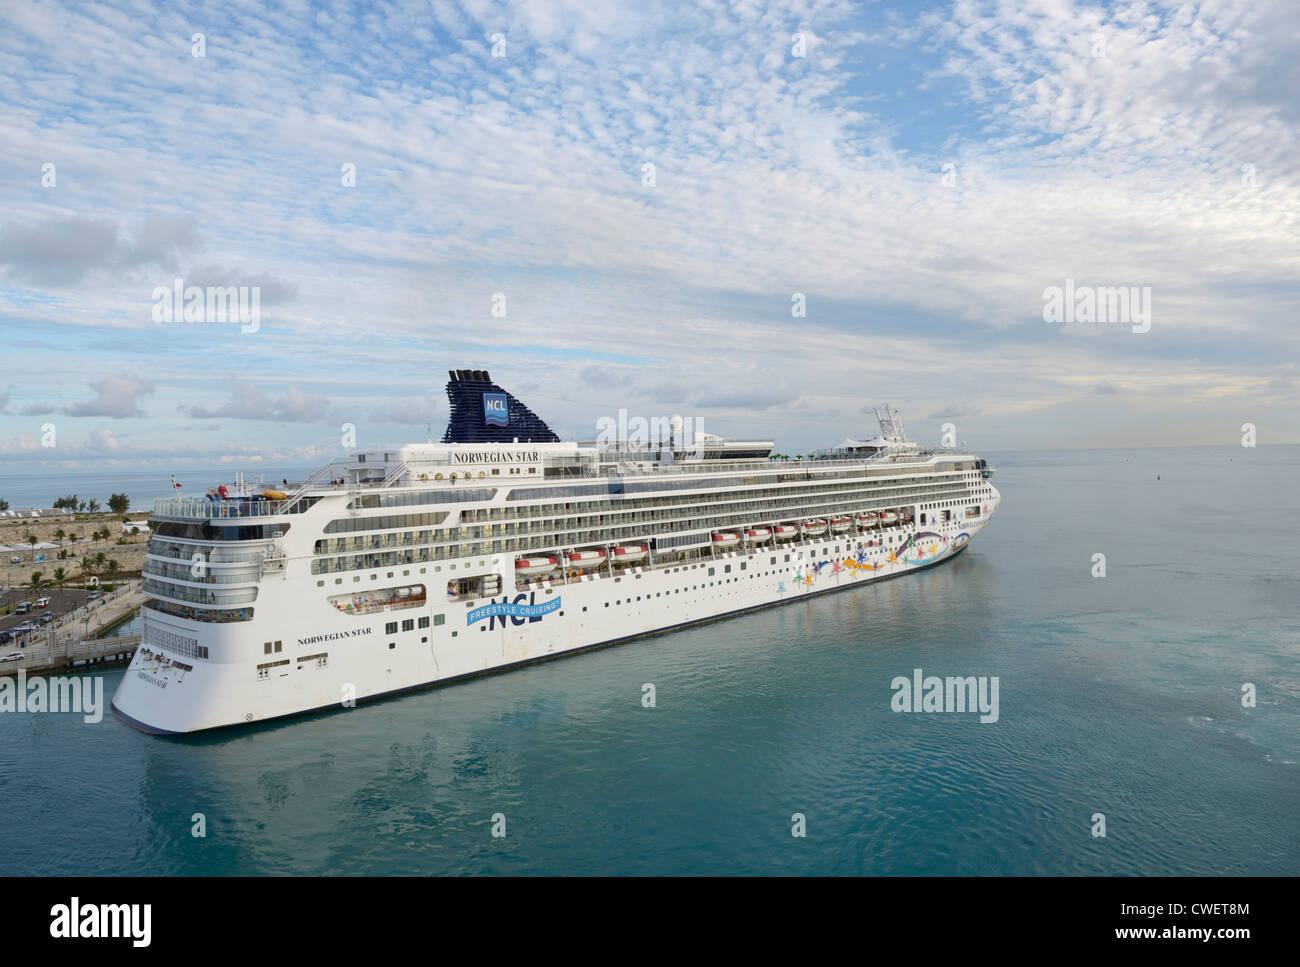 Cruise ship docked at King's Wharf, Bermuda - Stock Image